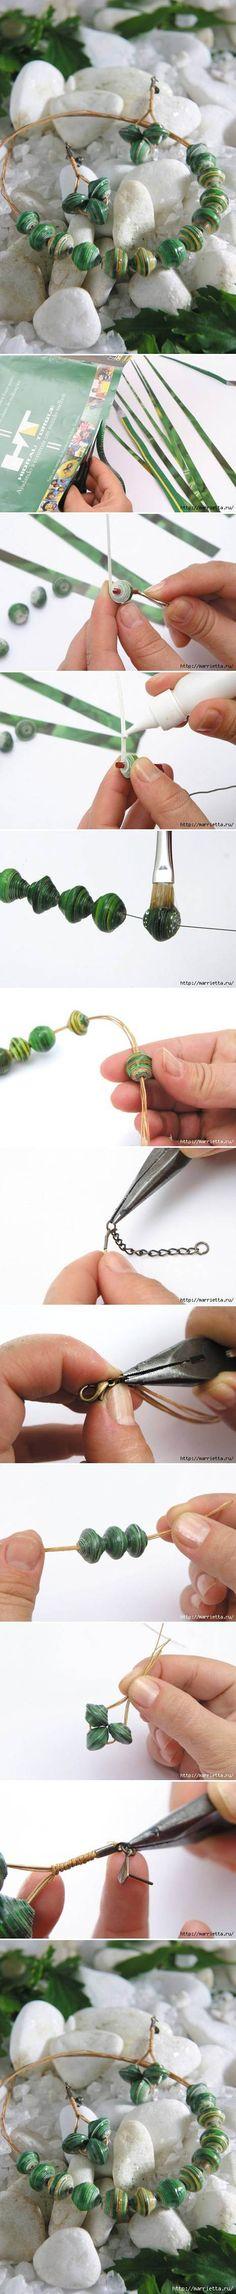 Pin by Στελλα Stella on jewellery & diy ideas κοσμήματα ювелирные ...